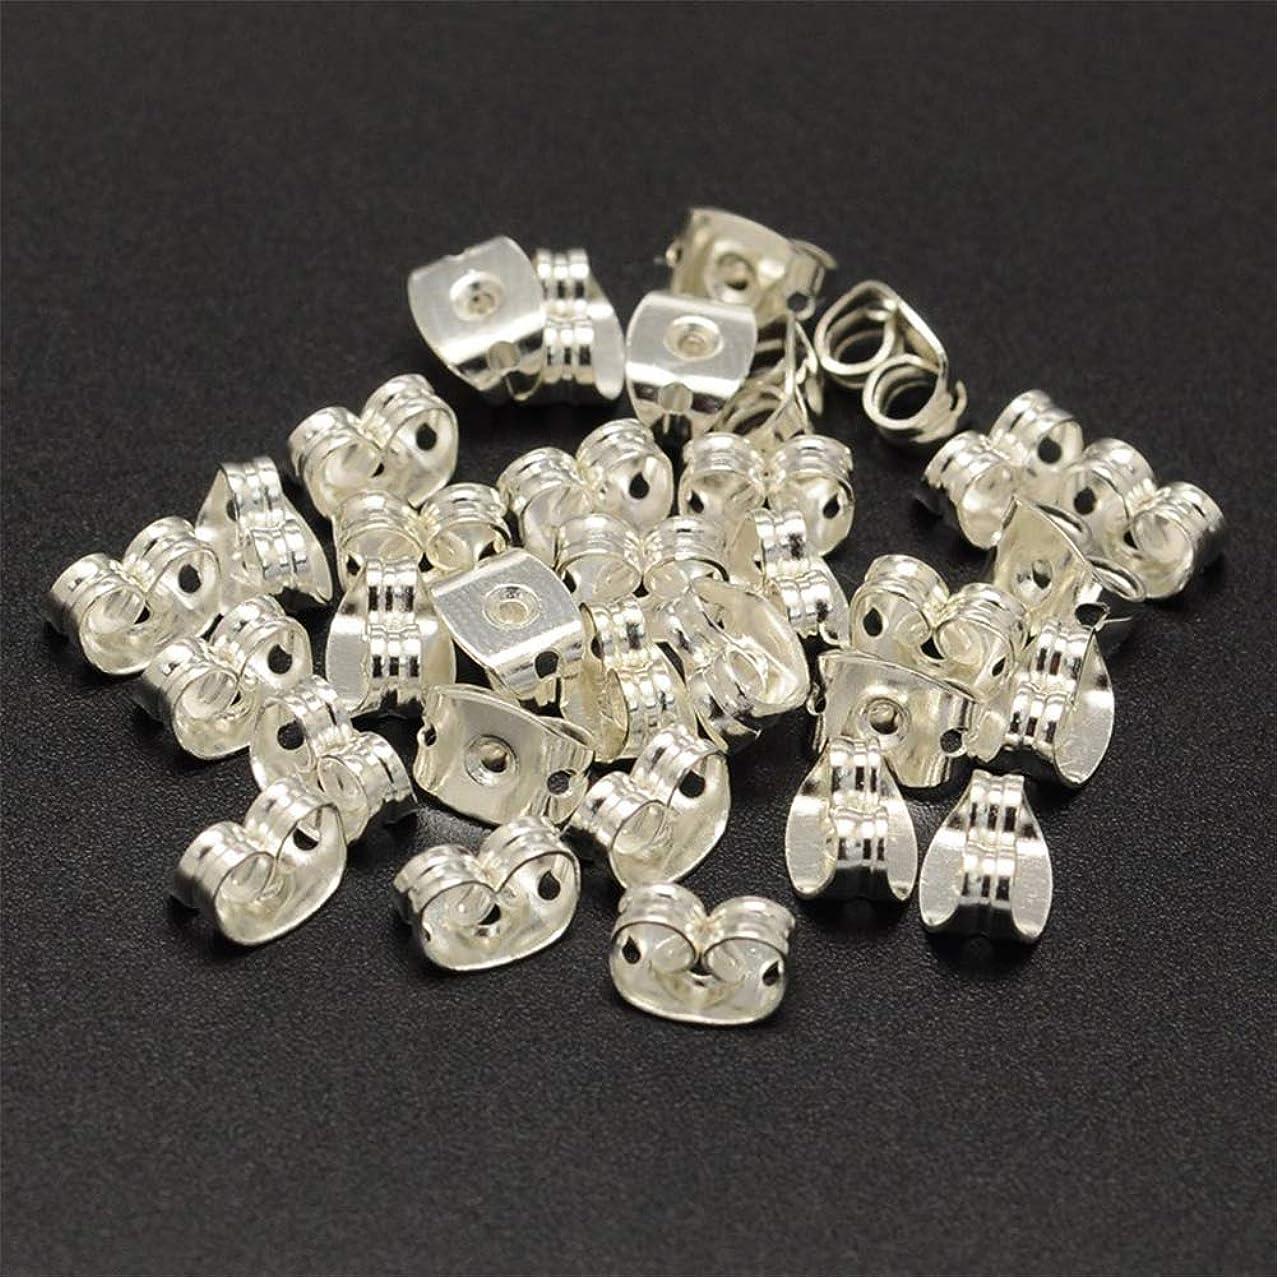 PH PandaHall 2000pcs Environmental Brass Earnuts Butterfly Shape Earring Backs Silver Earring Stoppers Cadmium Free & Lead Free for Drooping Earrings